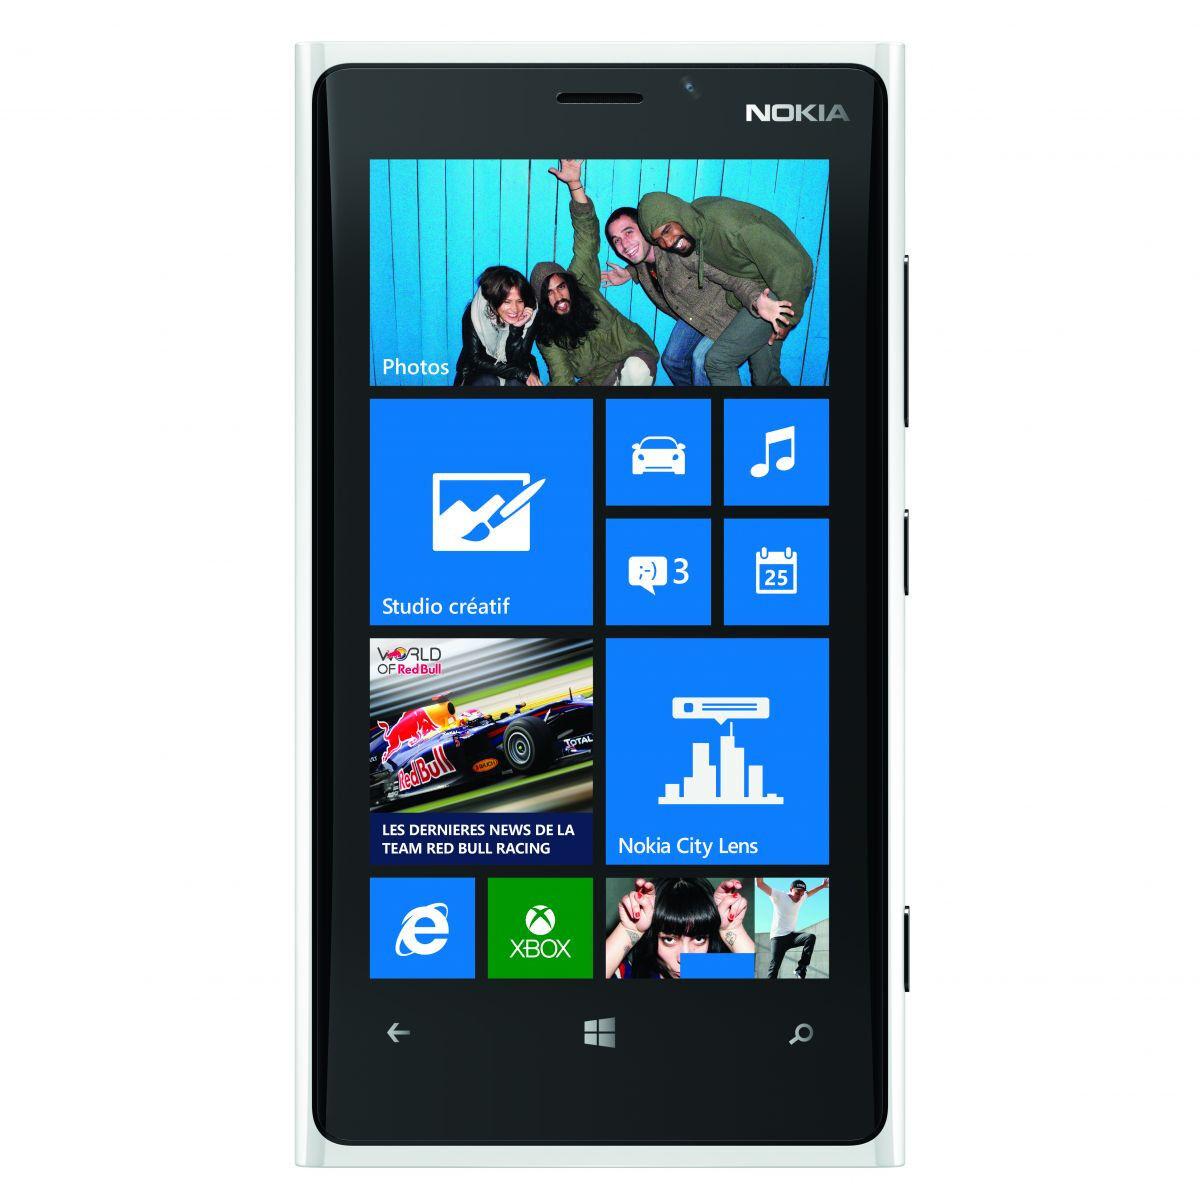 New Nokia Lumia 920 32GB at T Unlocked GSM Phone Windows 8 OS 8MP Camera Wi Fi